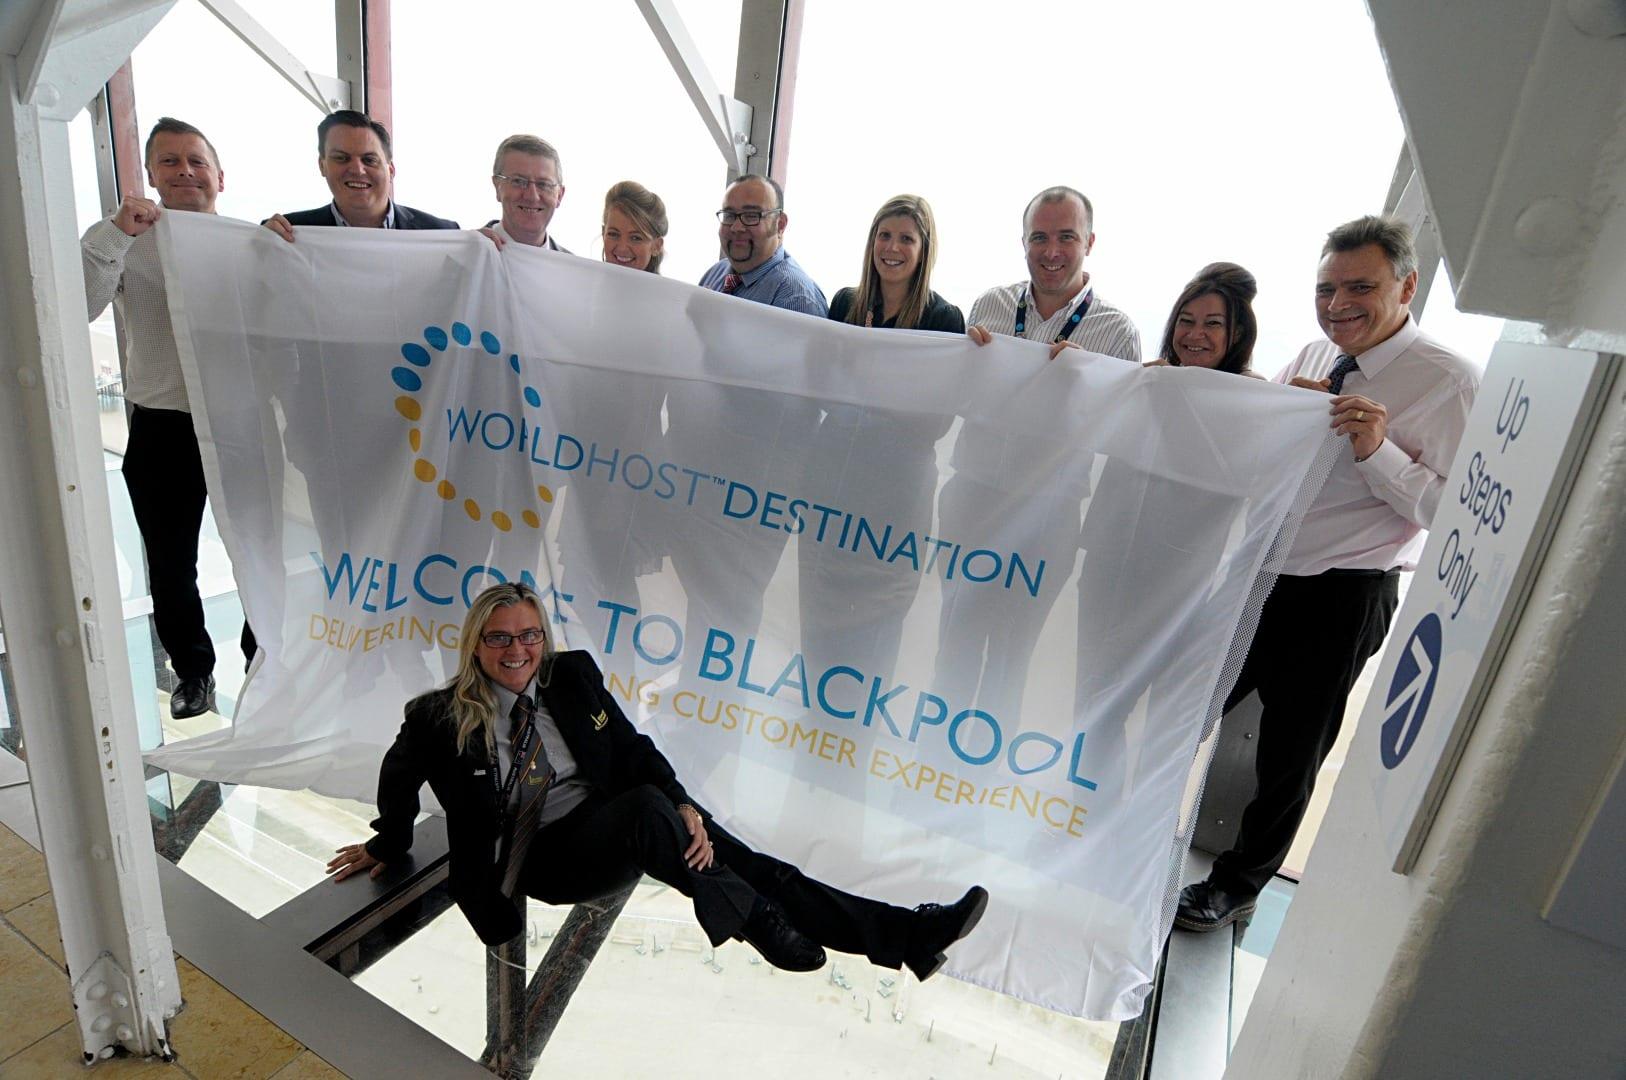 Blackpool schieves WorldHost status